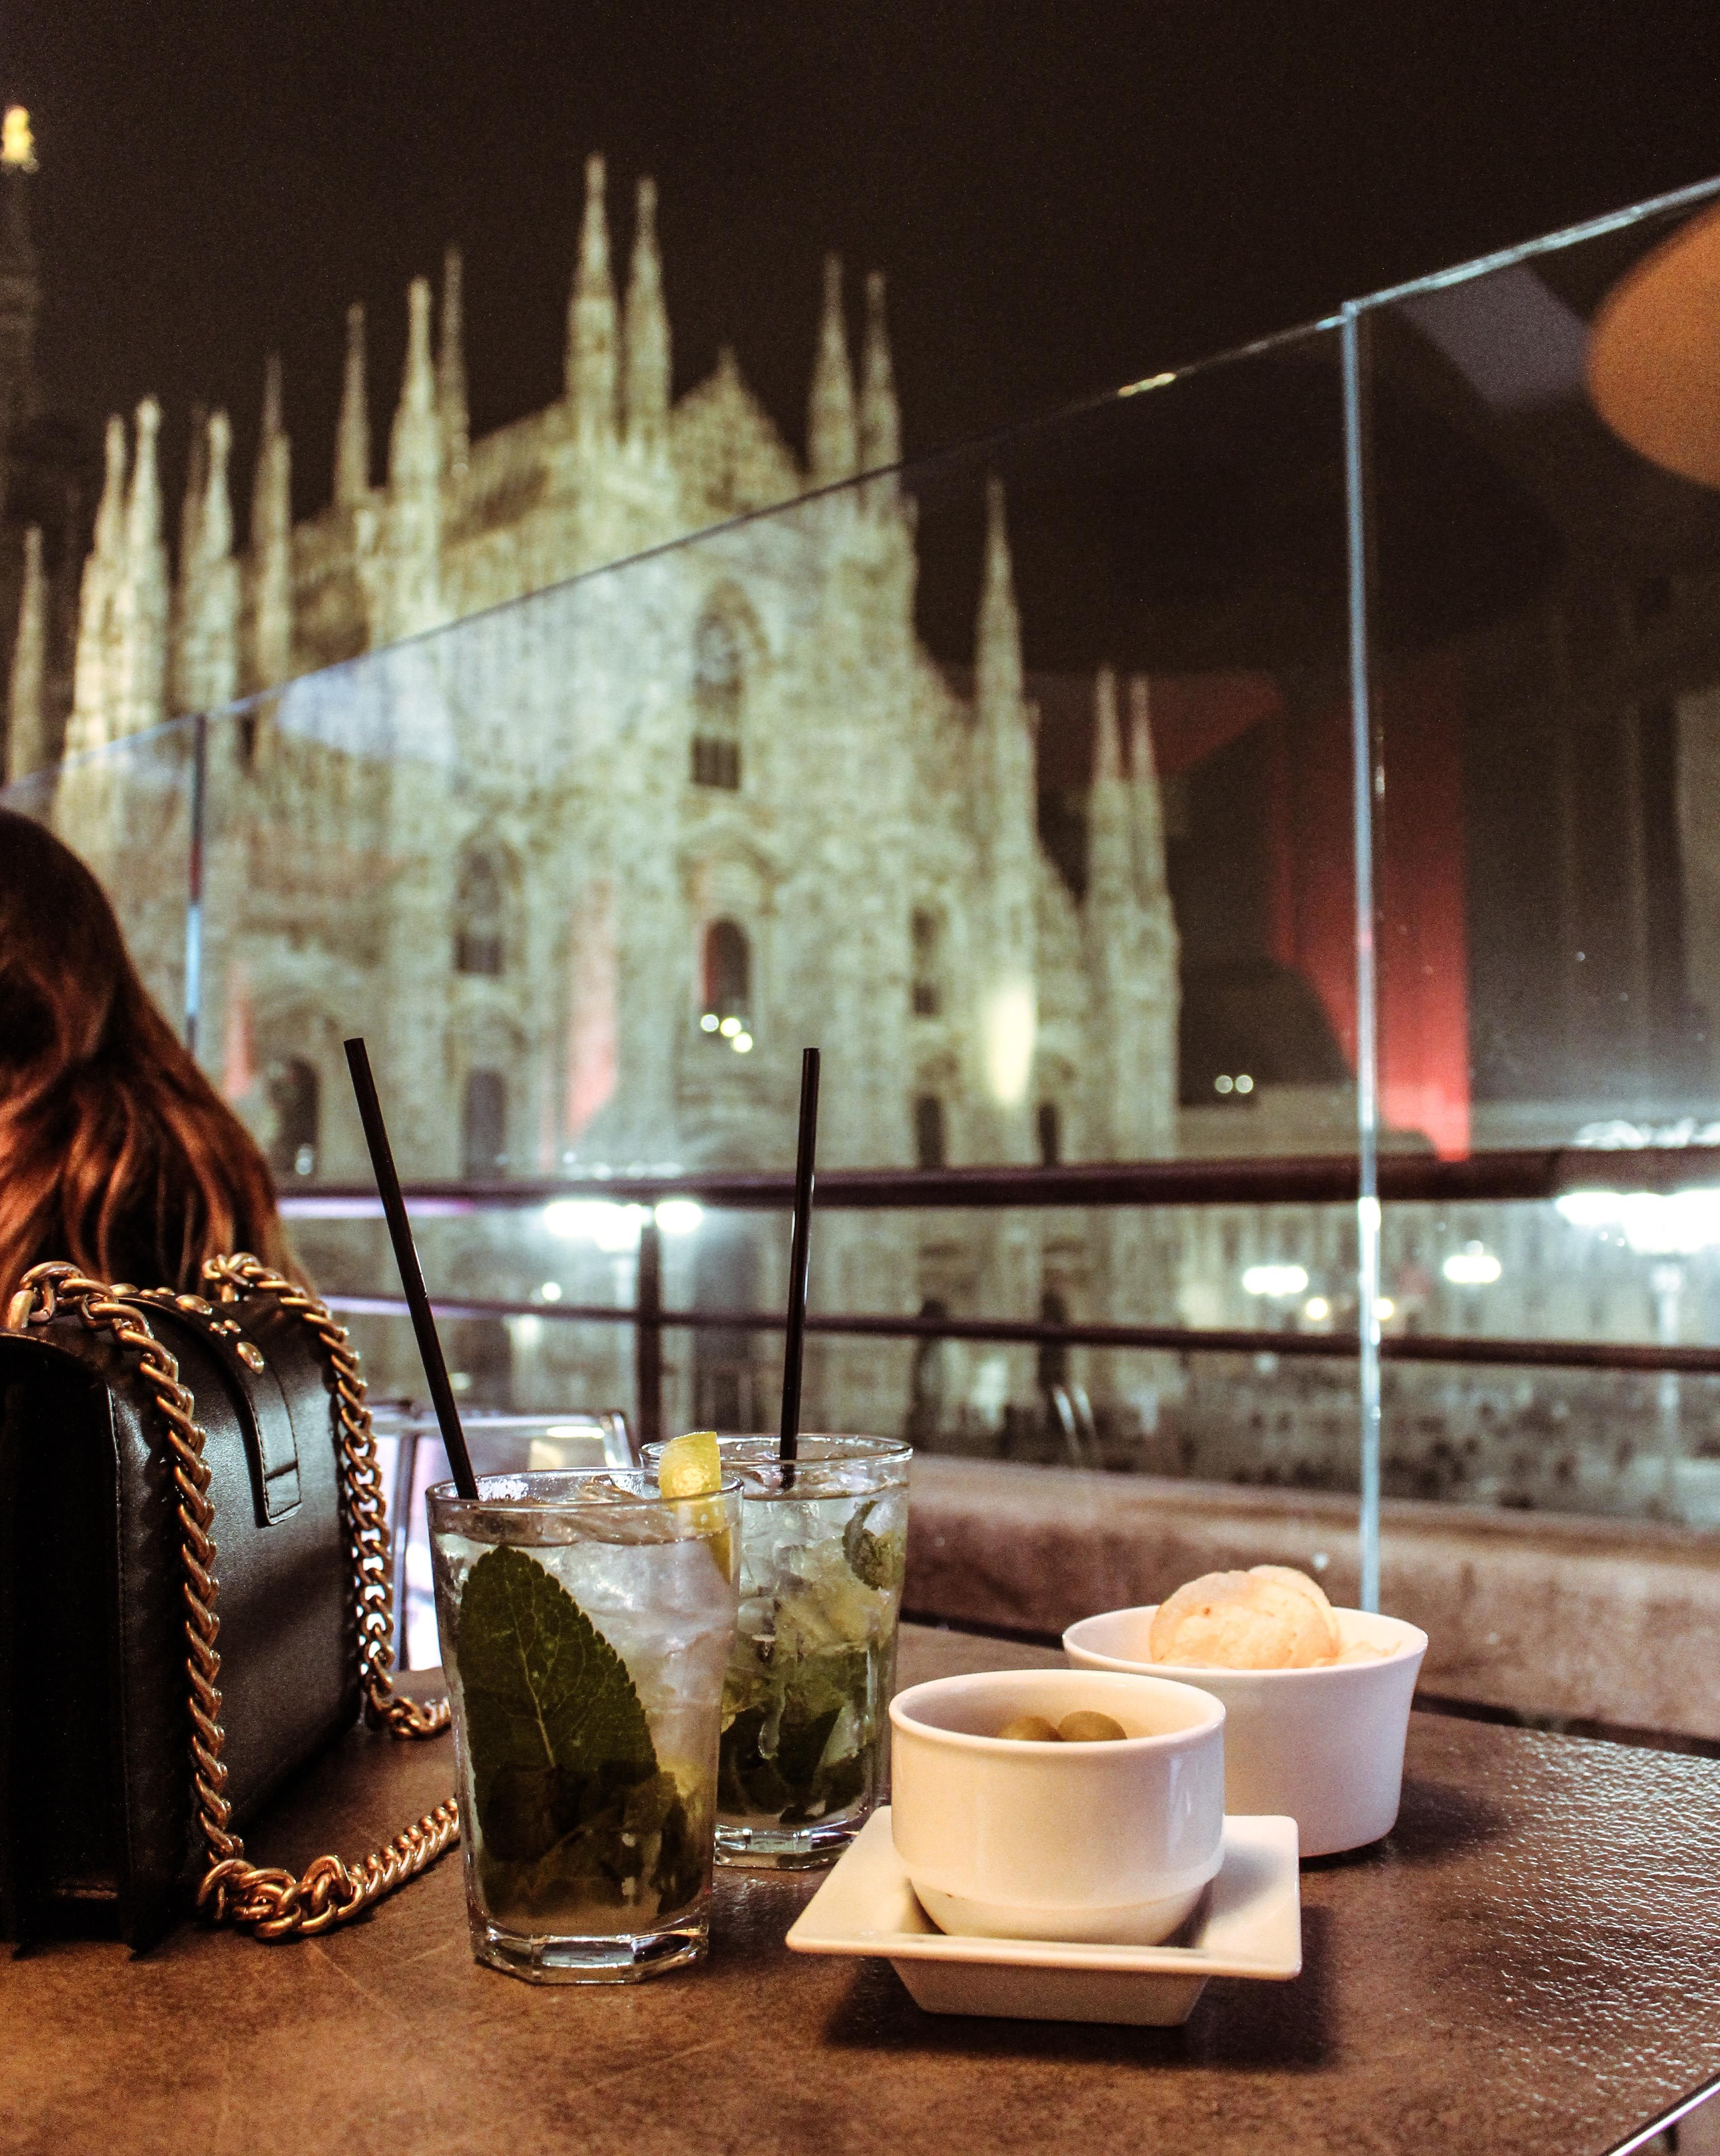 #milan #milano #mediolan #food #italianfood #italy #eat